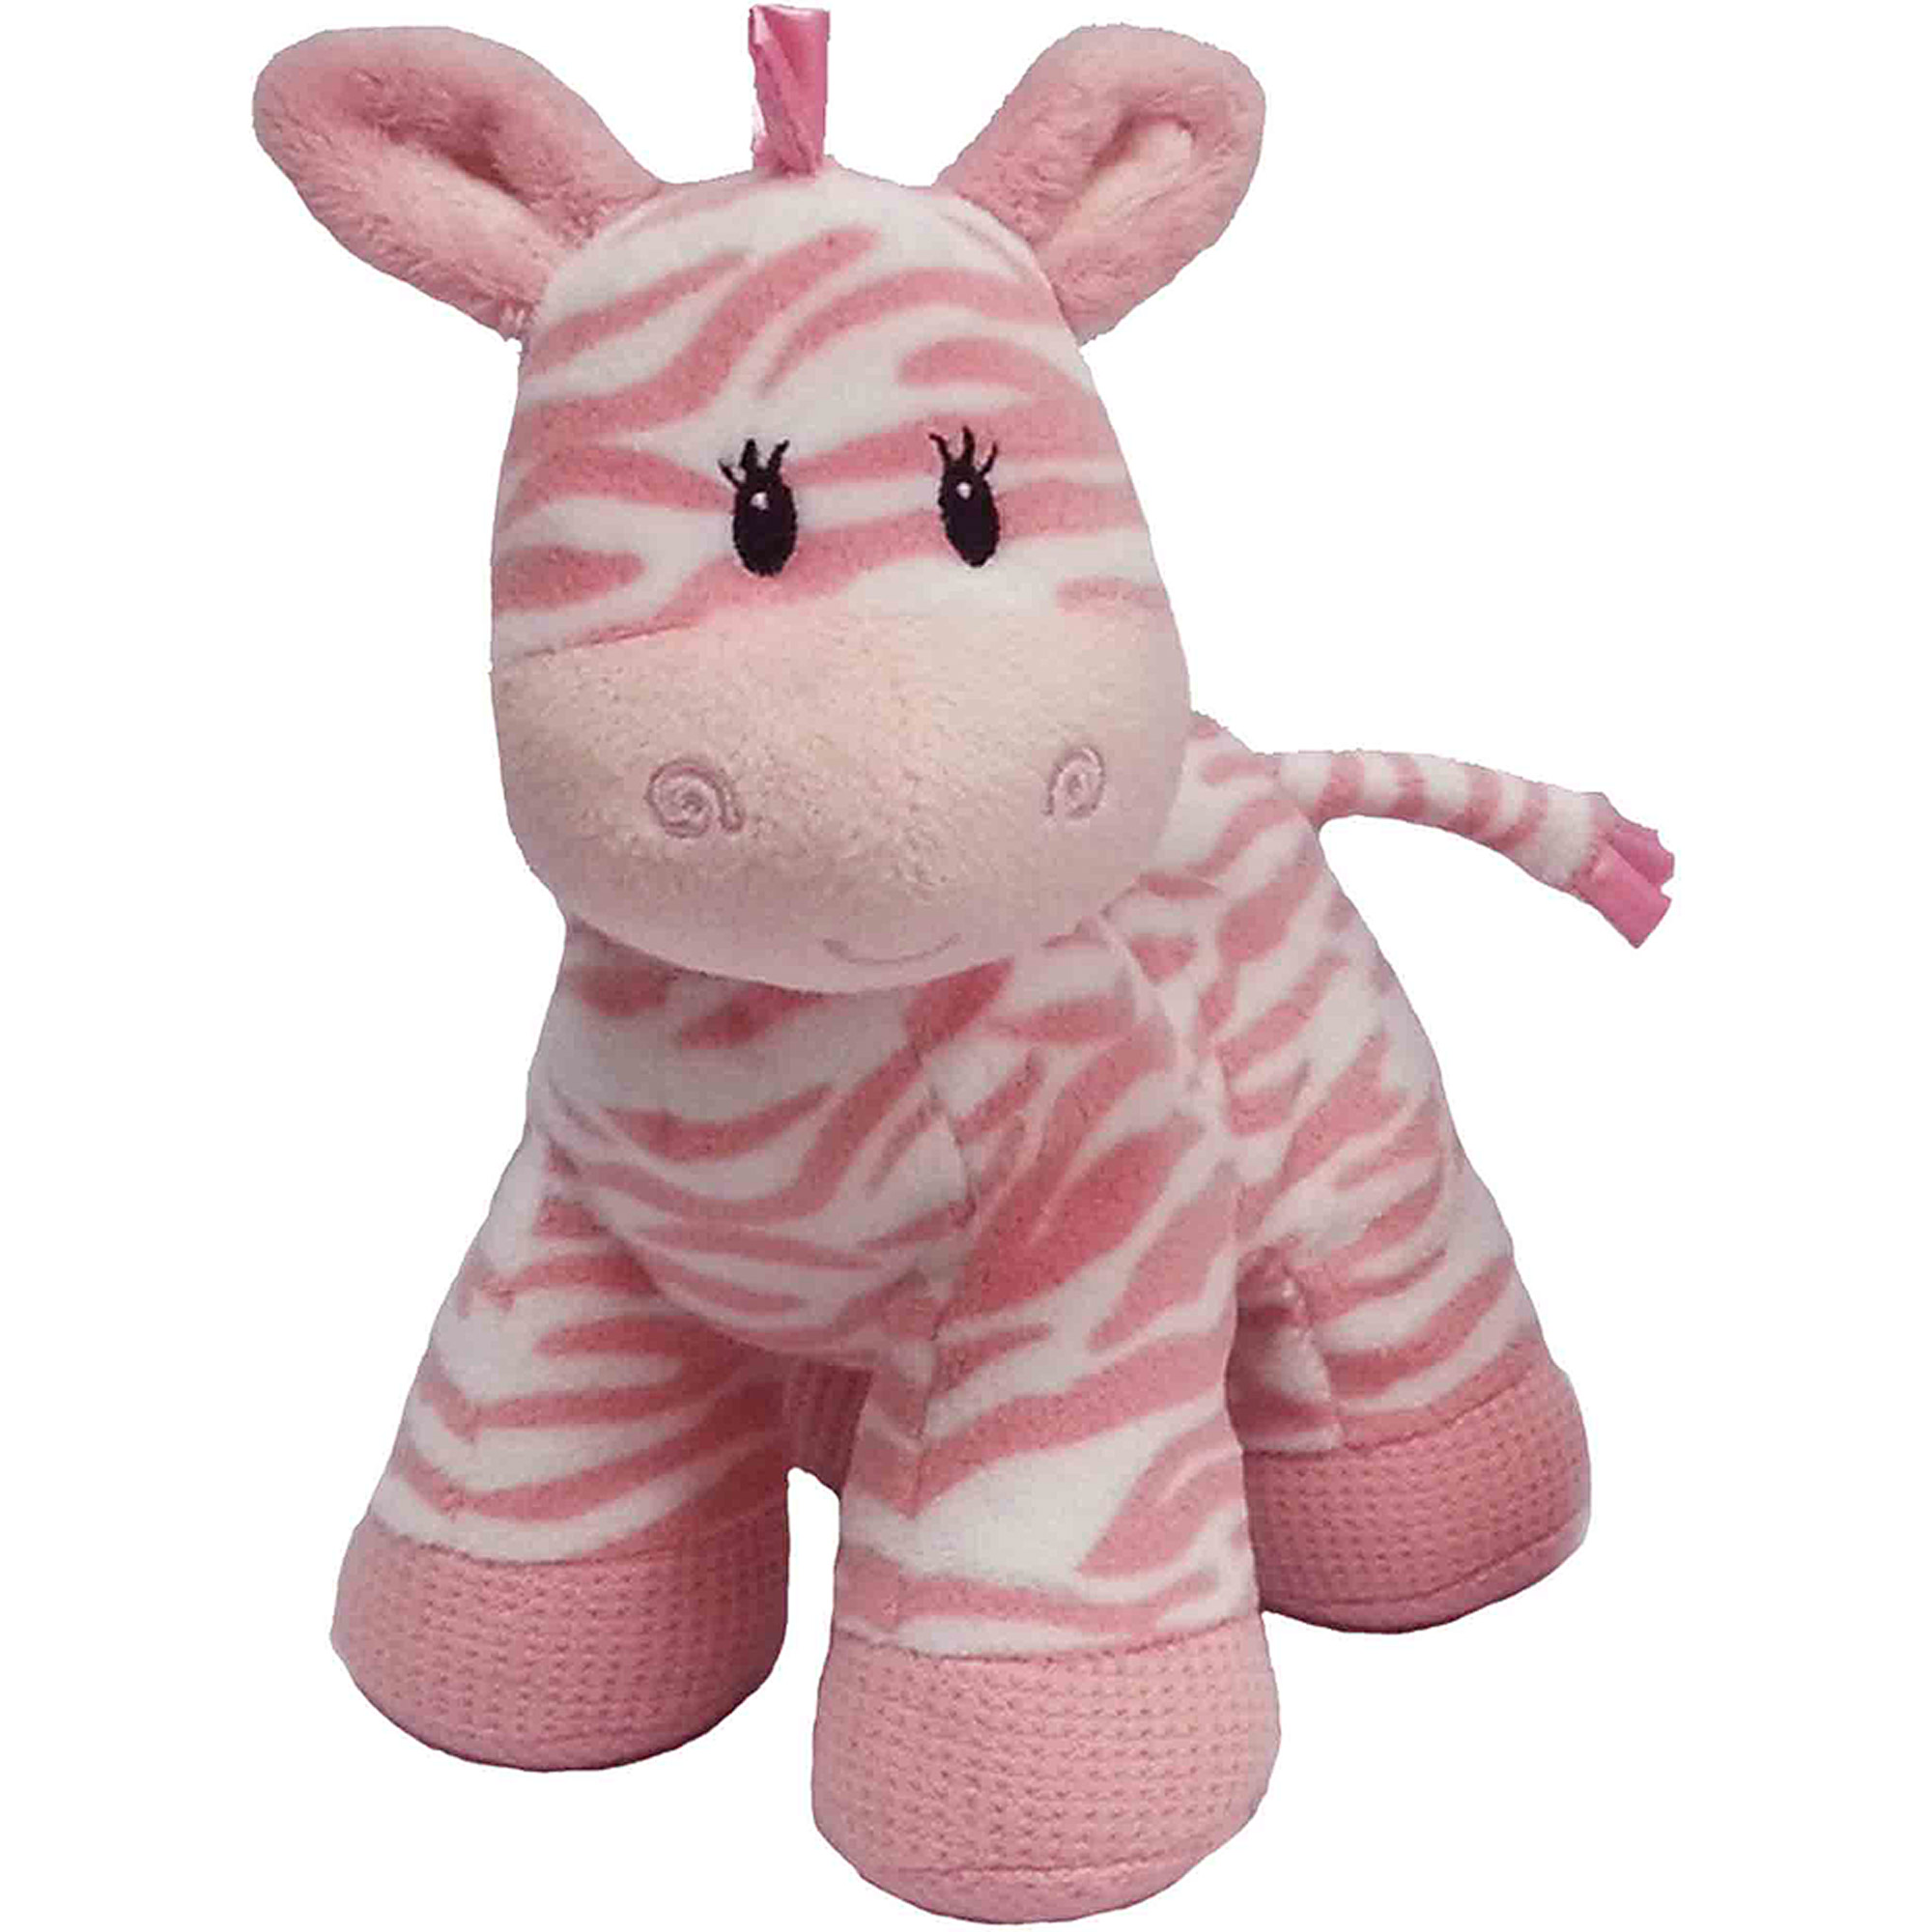 "First and Main Zippy Zebra 8"" Plush, Pink"